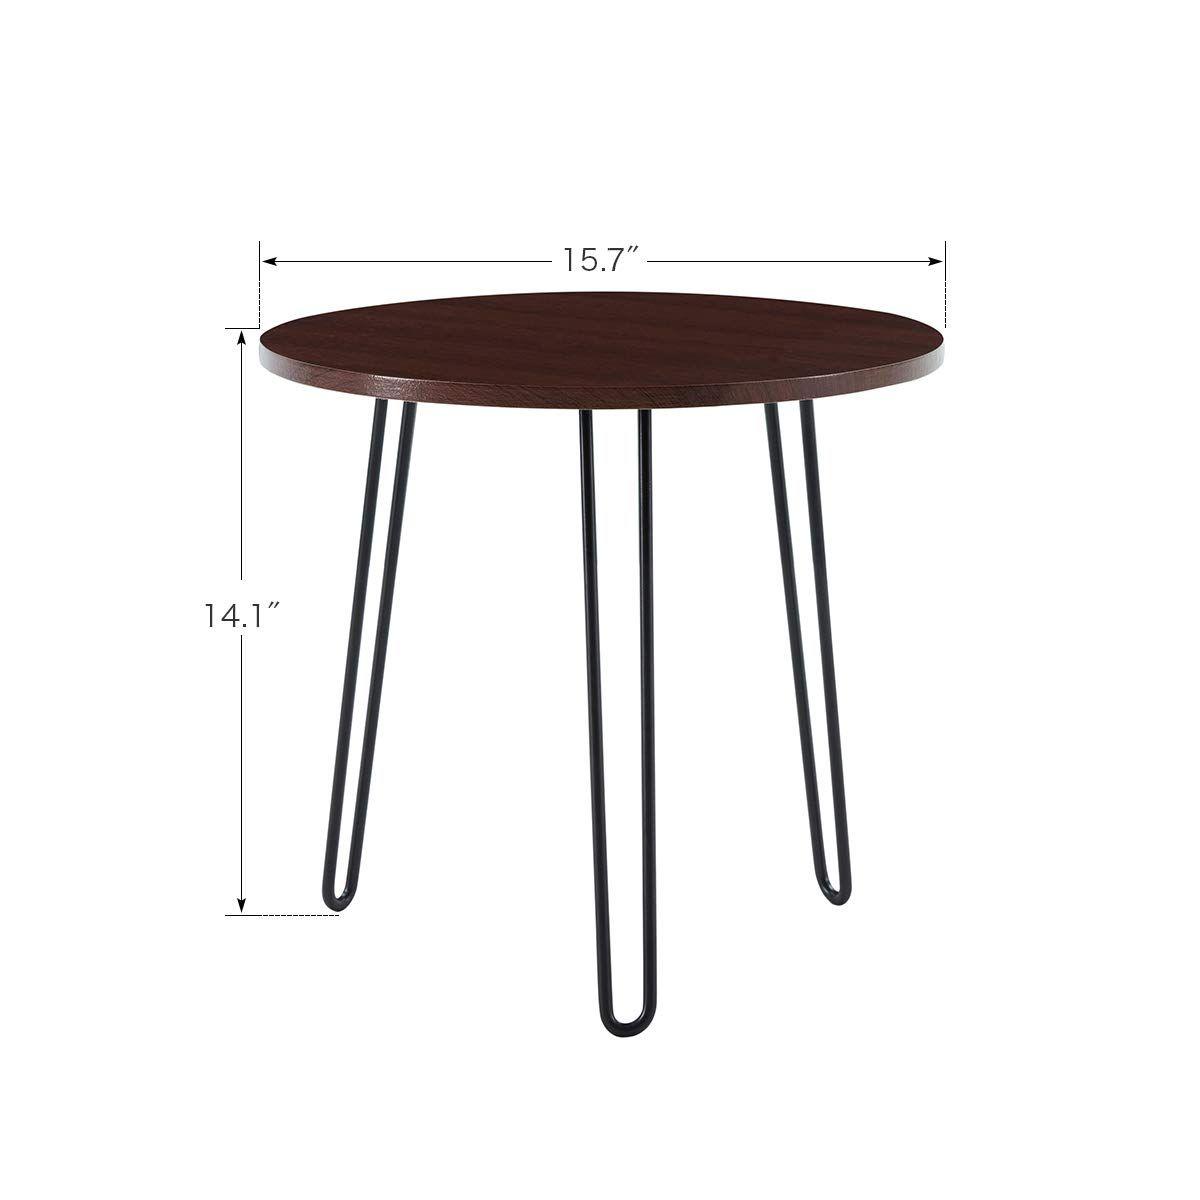 Modern Modern Coffee Tables Modern Side Table Round Coffee Table Modern [ 1200 x 1200 Pixel ]